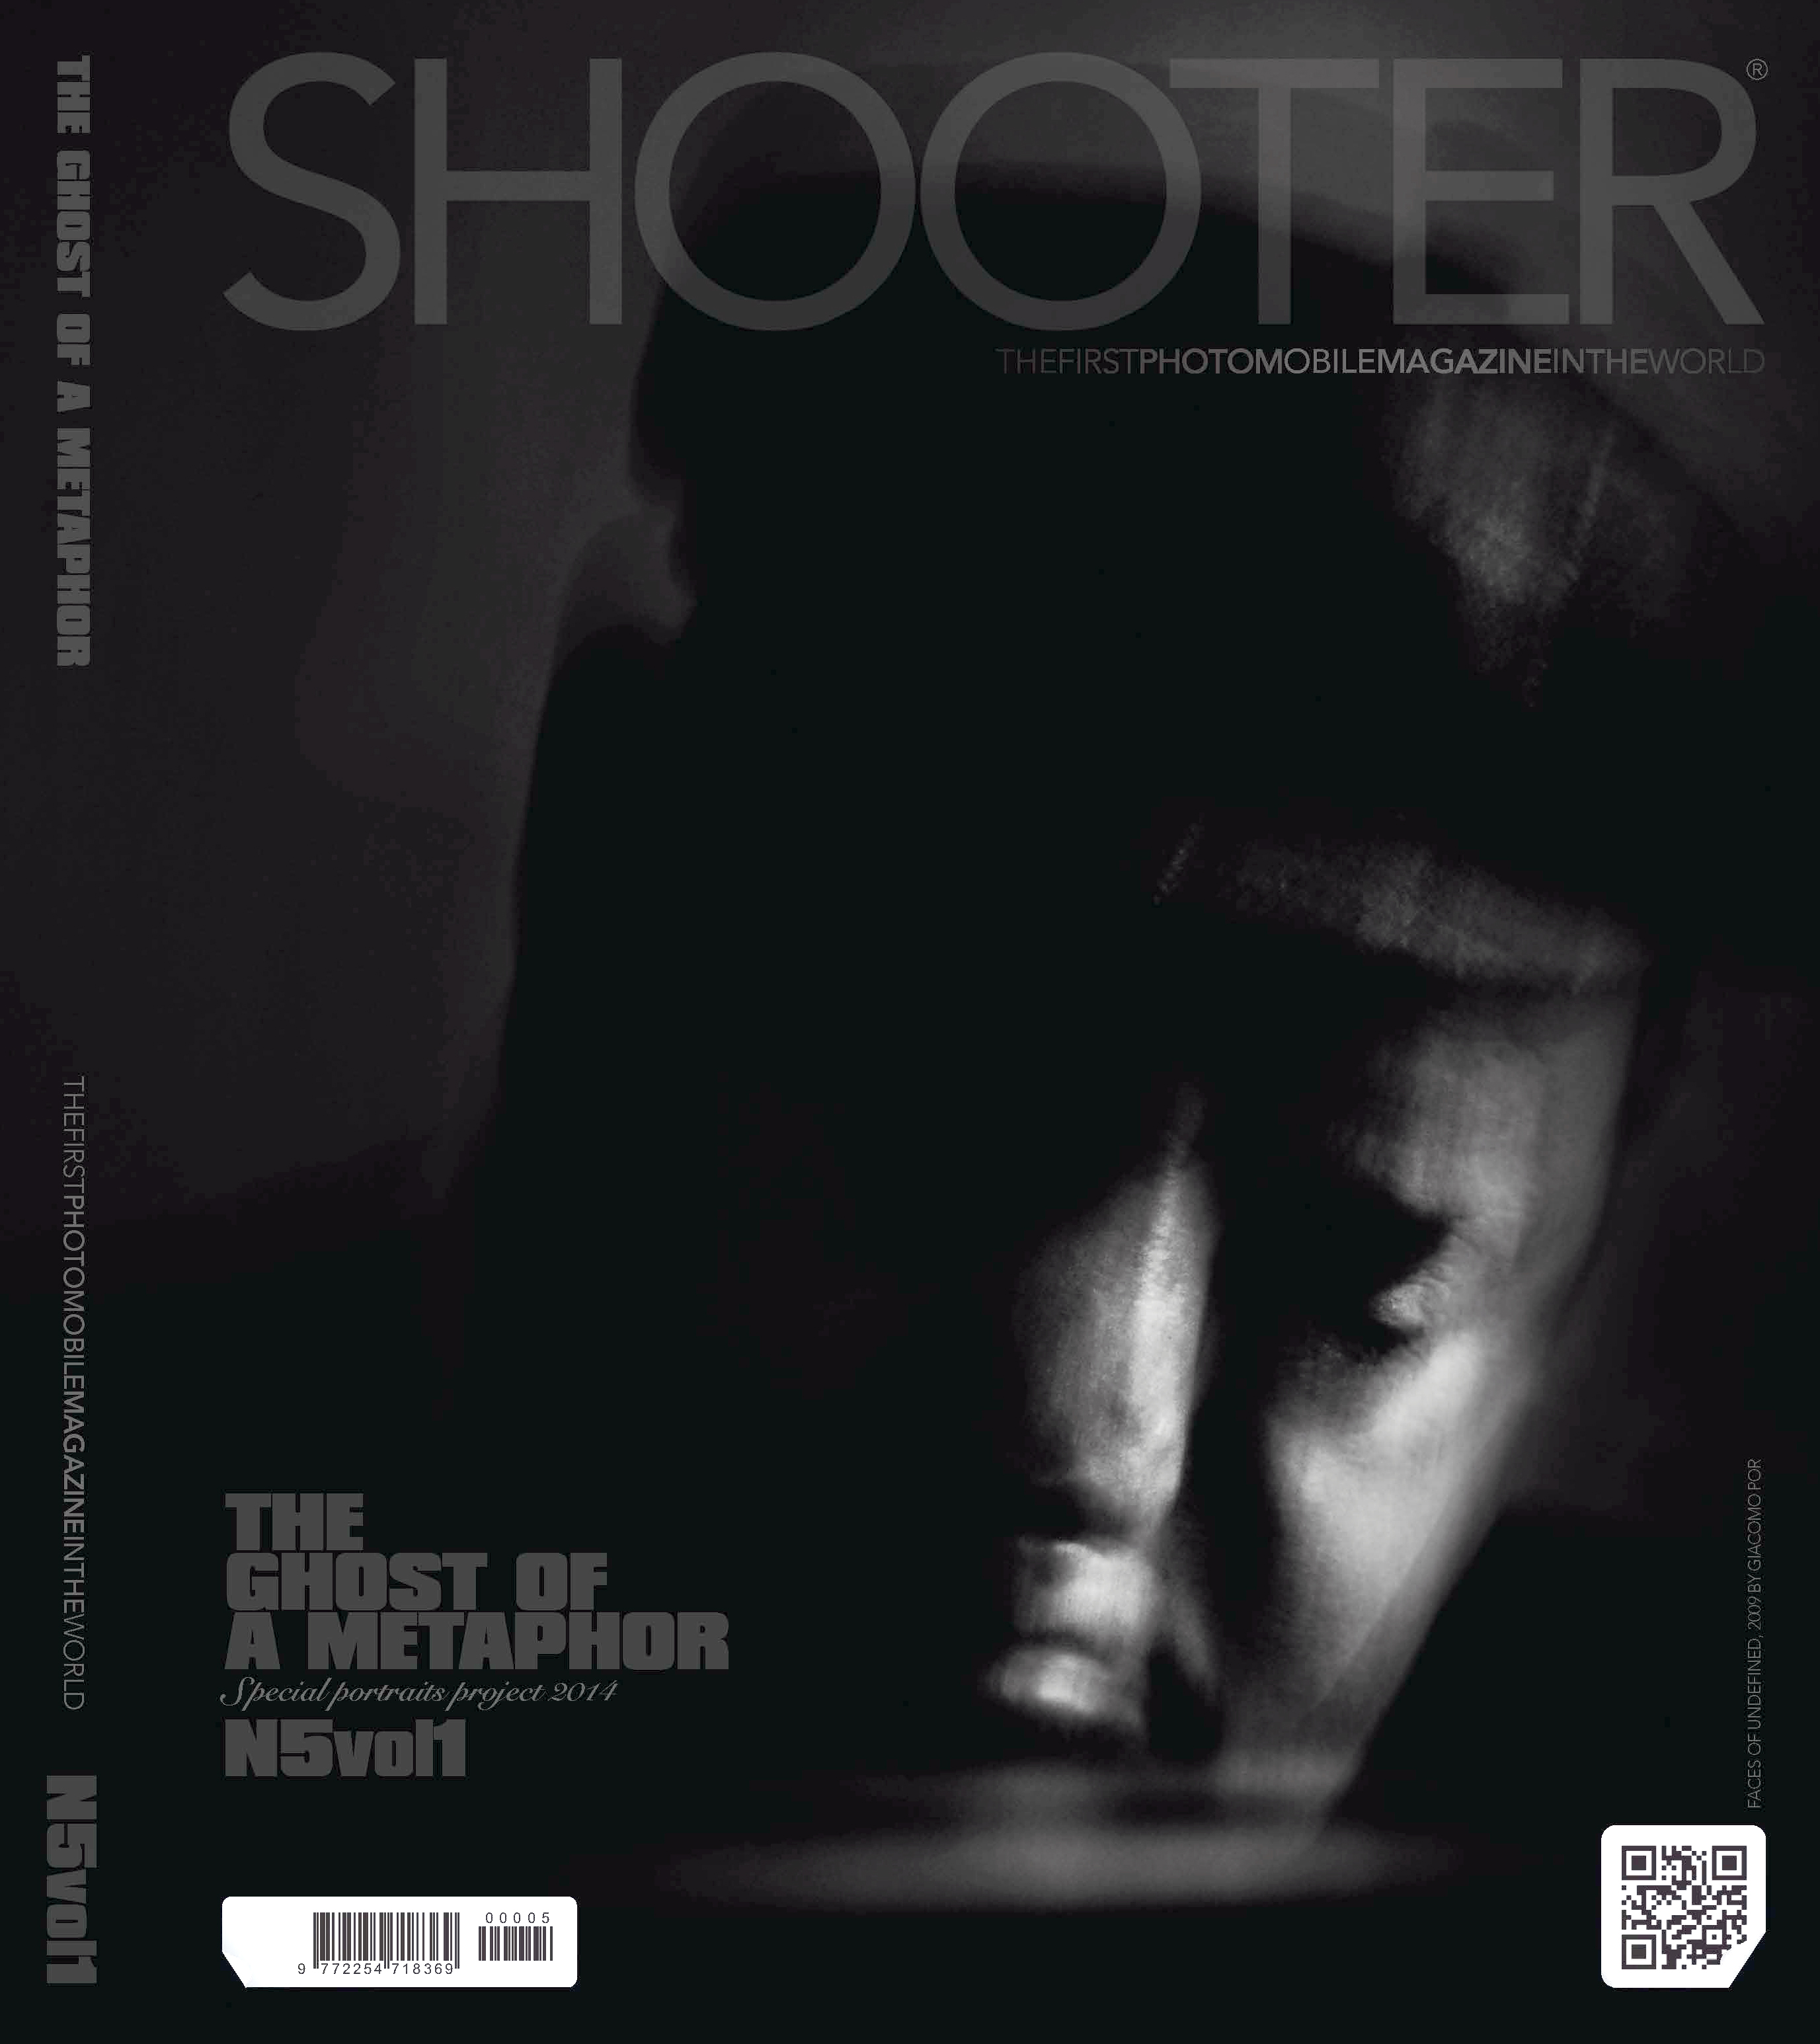 0A COVER SHOOTER N5 DESPLEGABLEMaquetacin 2Page2 N5